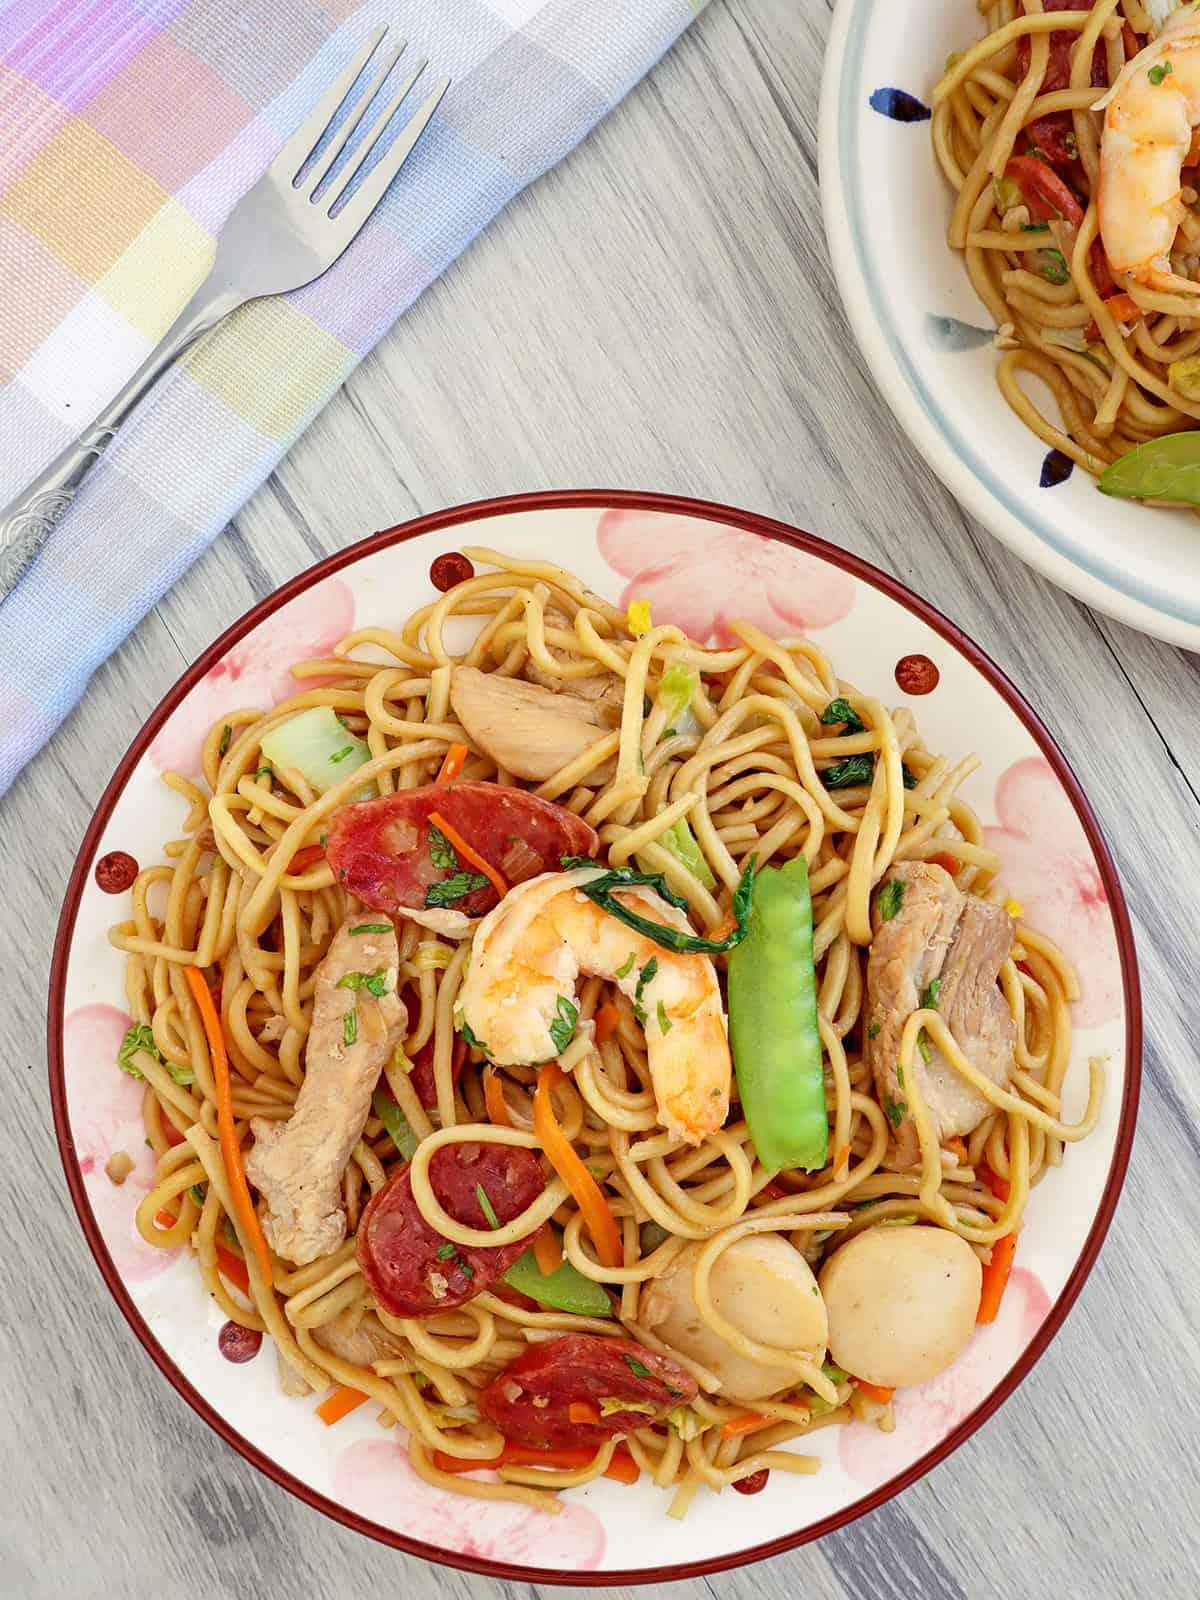 Filipino pancit canton guisado with shrimp, sausage, and veggies on a plate